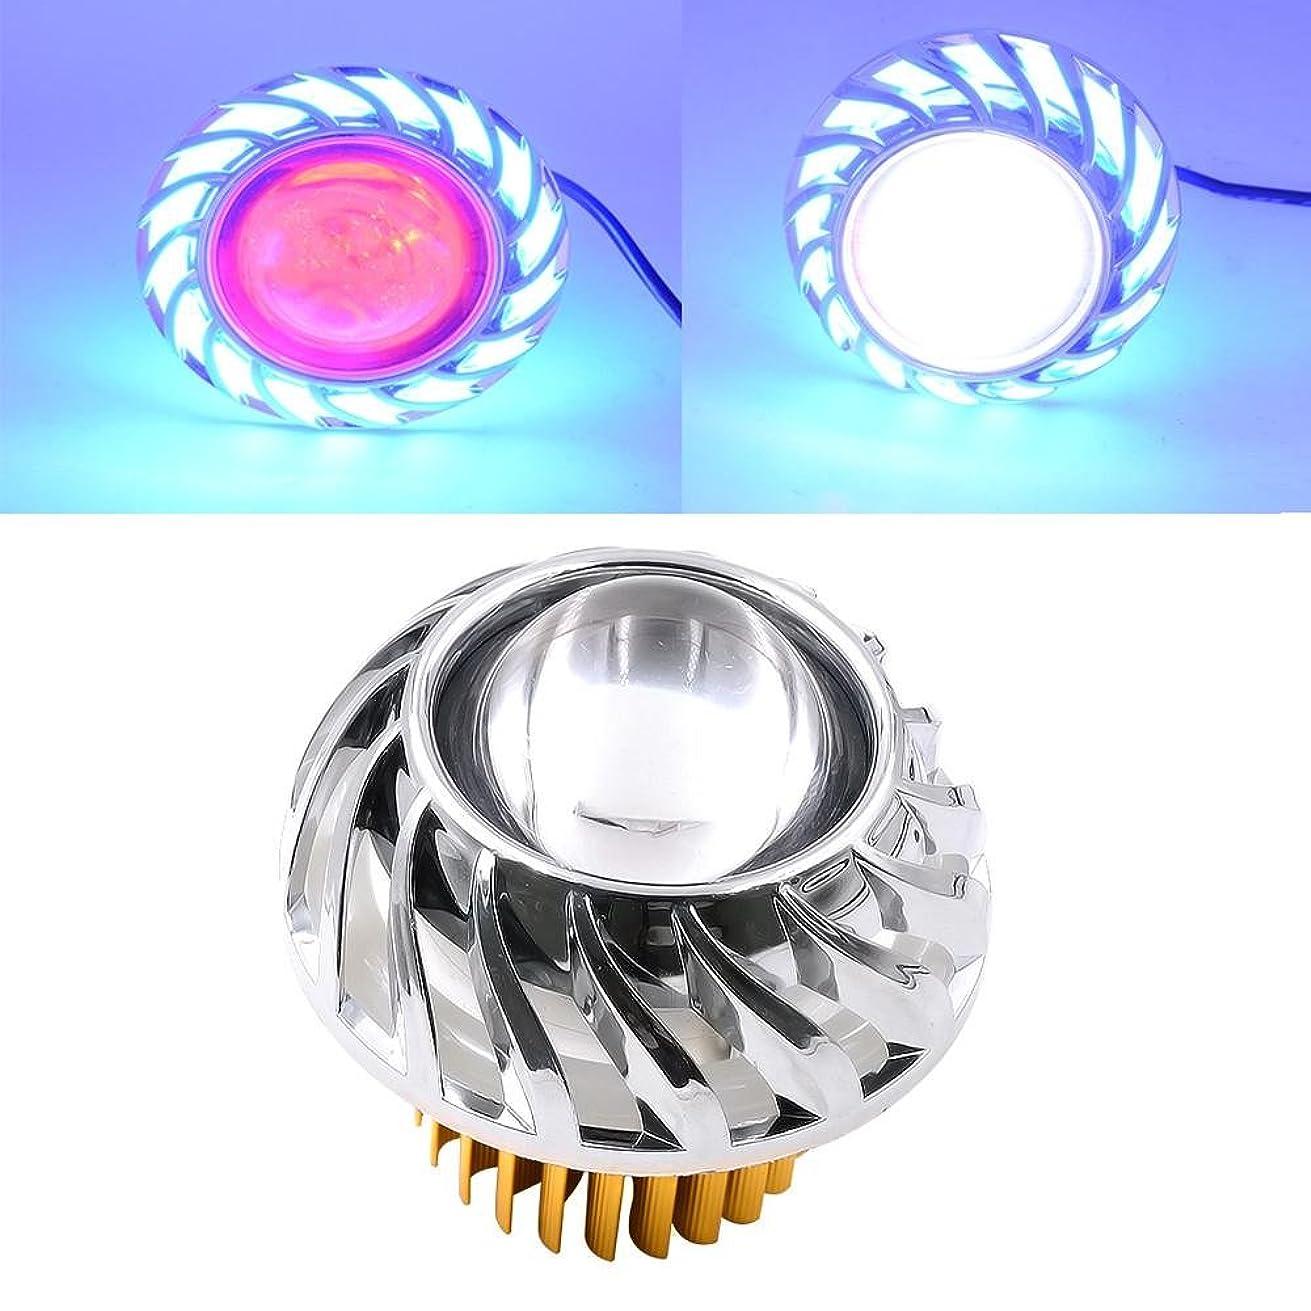 Quaanti 2018 New Arrival High/Low Beam LED Headlight For Motorcycle Angel Eyes White Devil Eye light car styling (Blue)